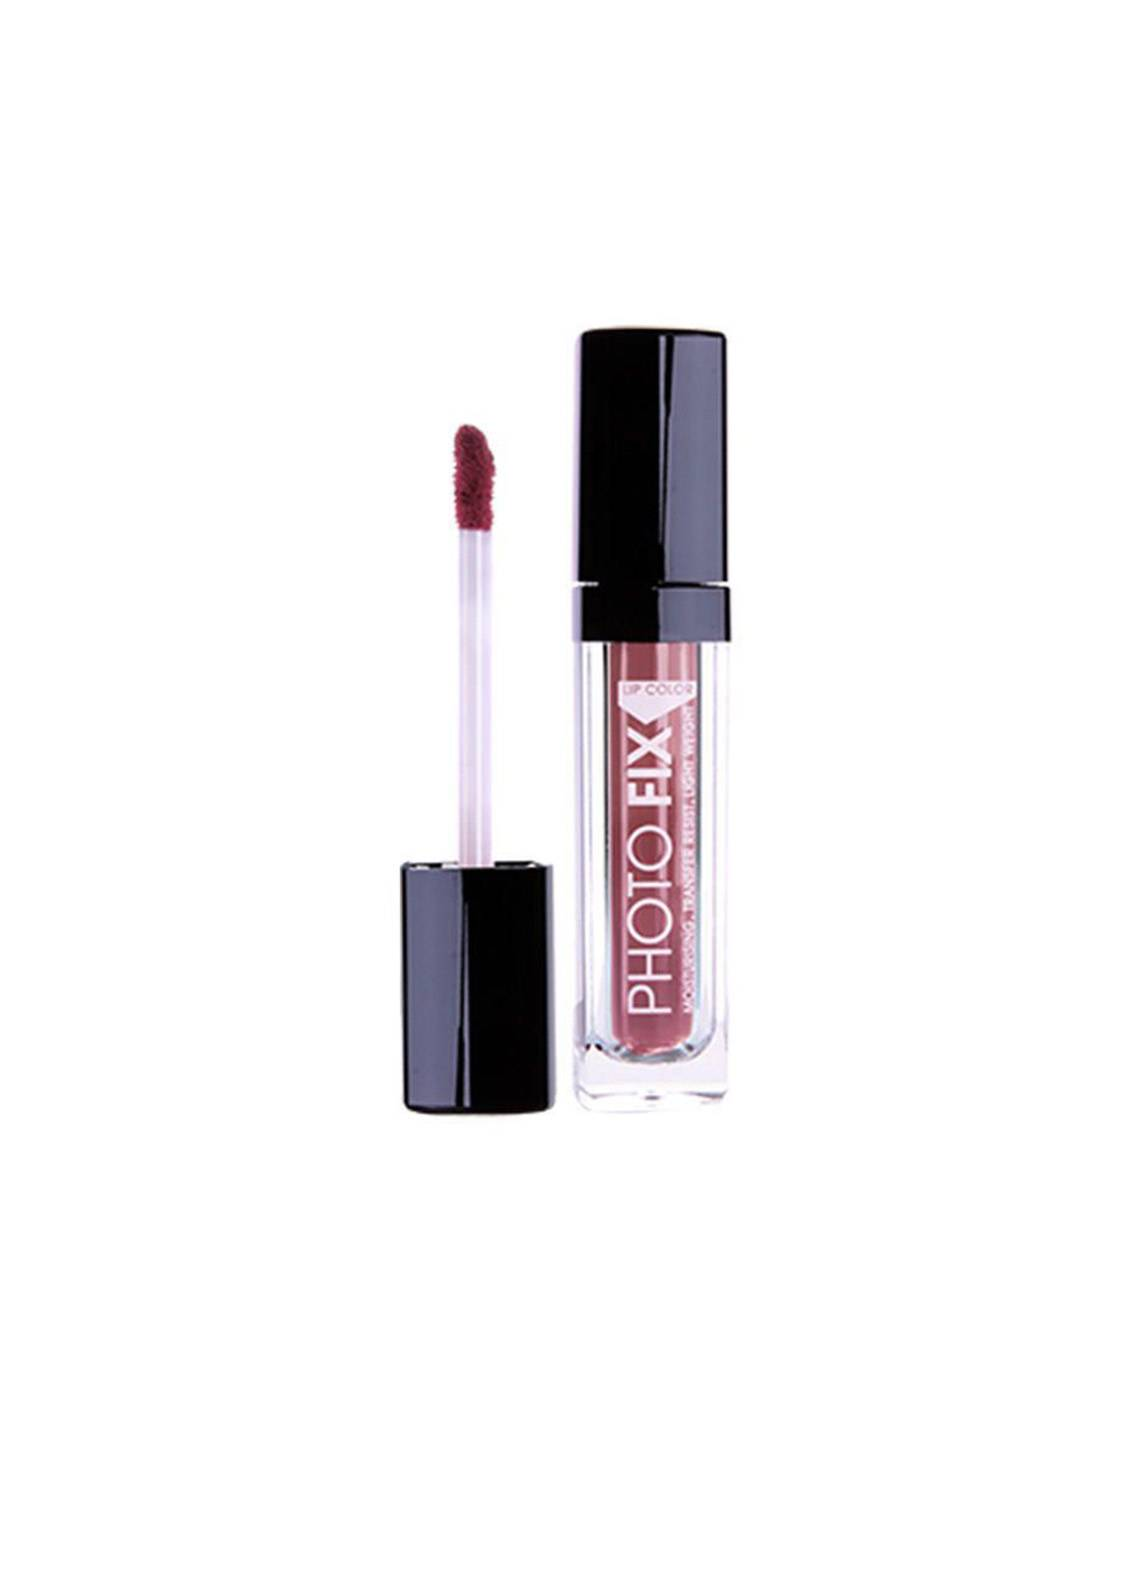 DMGM Photo Fix Lip Gloss - Bahama Spice-332